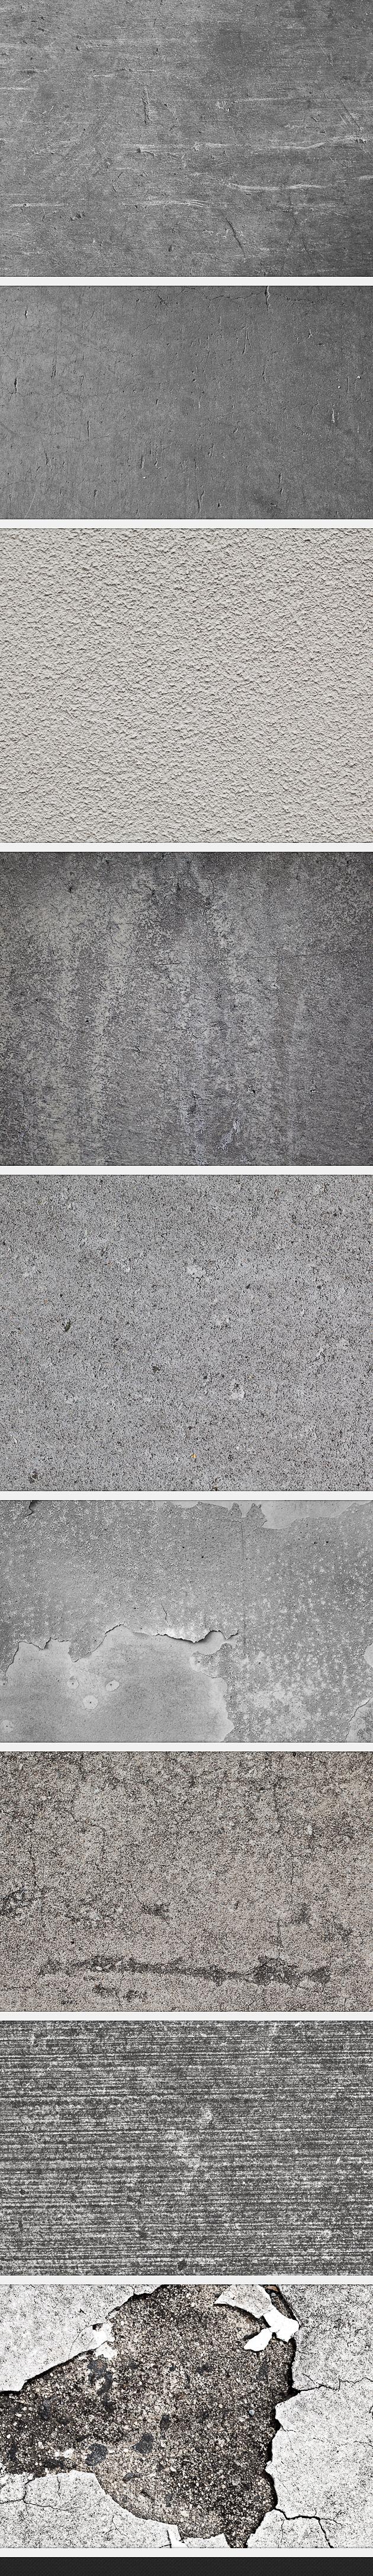 Grunge Cement Textures grunge cement textures large